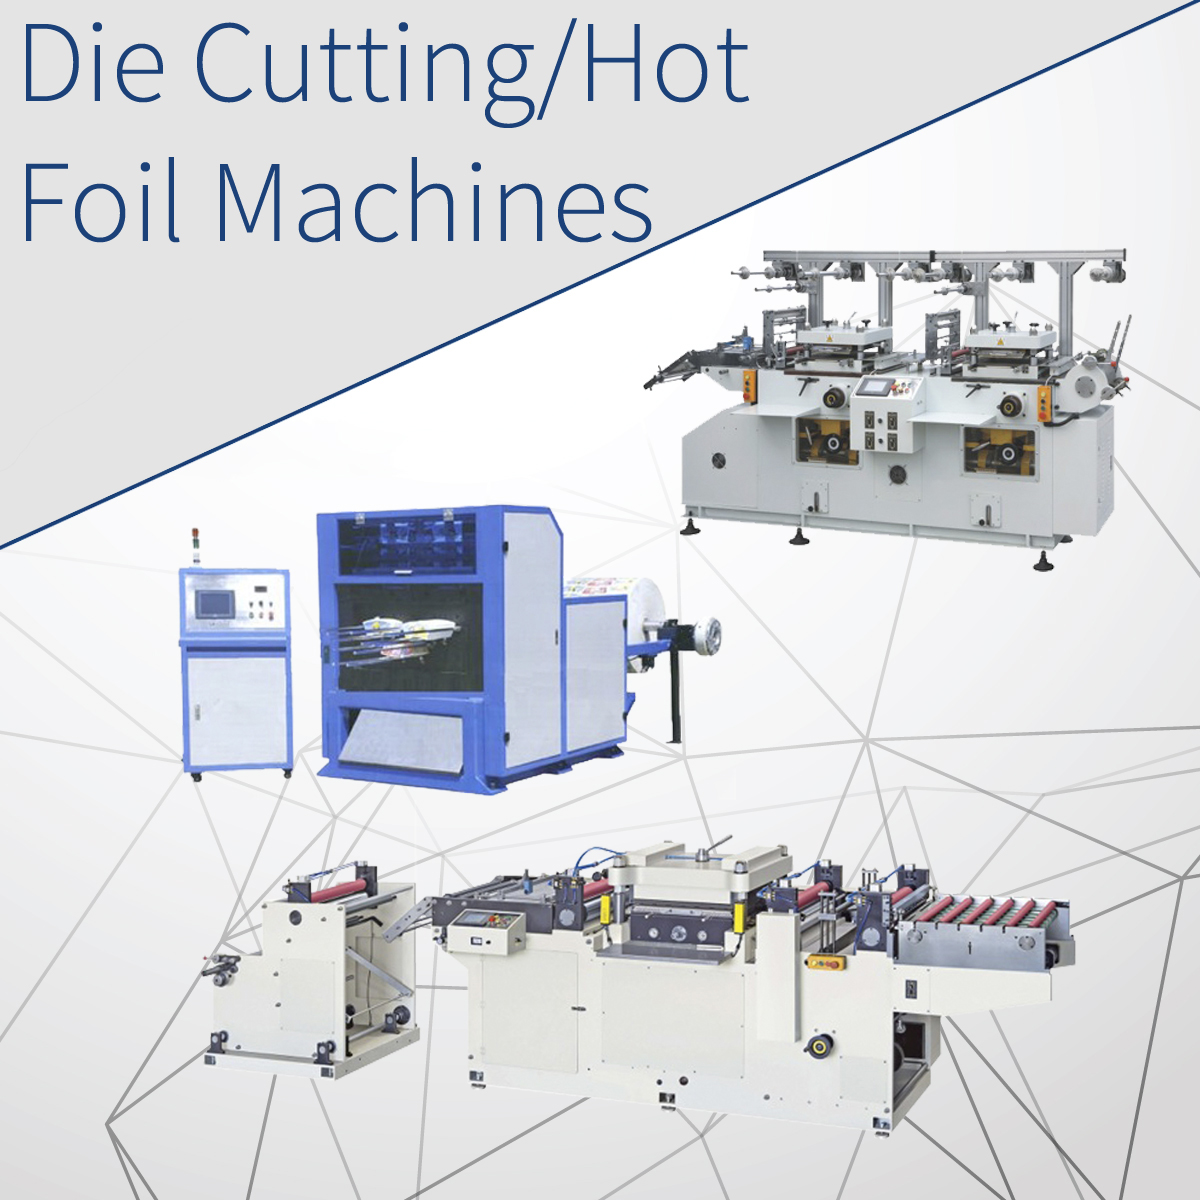 Die-Cutting-Hot Foil Machines.jpg